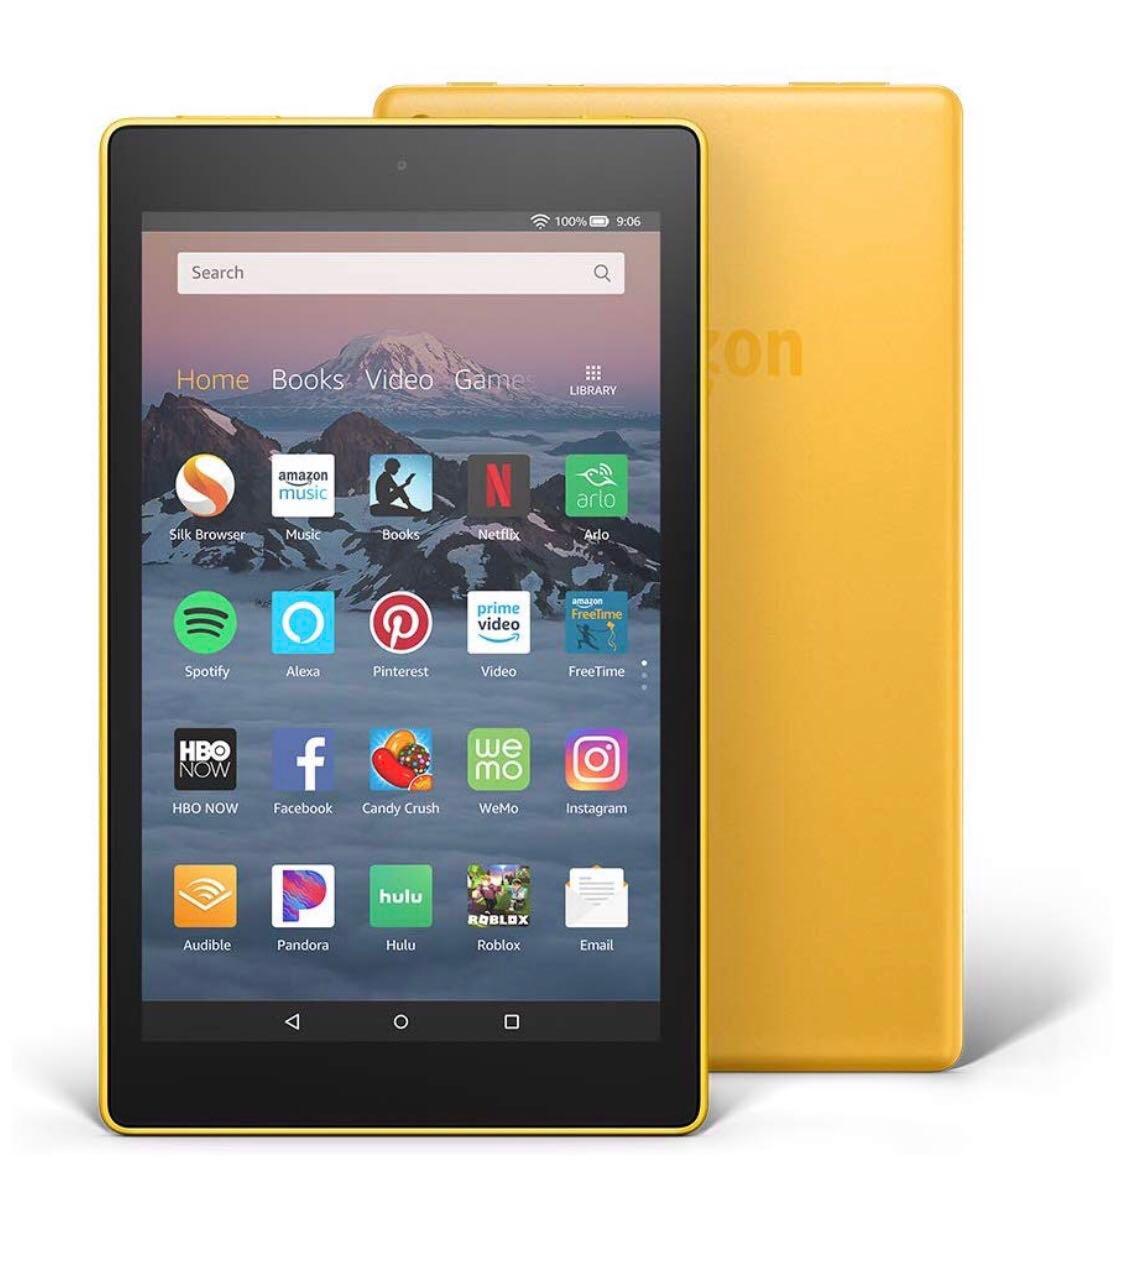 10f421cdb558 Amazon Fire HD 8 Tablet 2018 16GB version